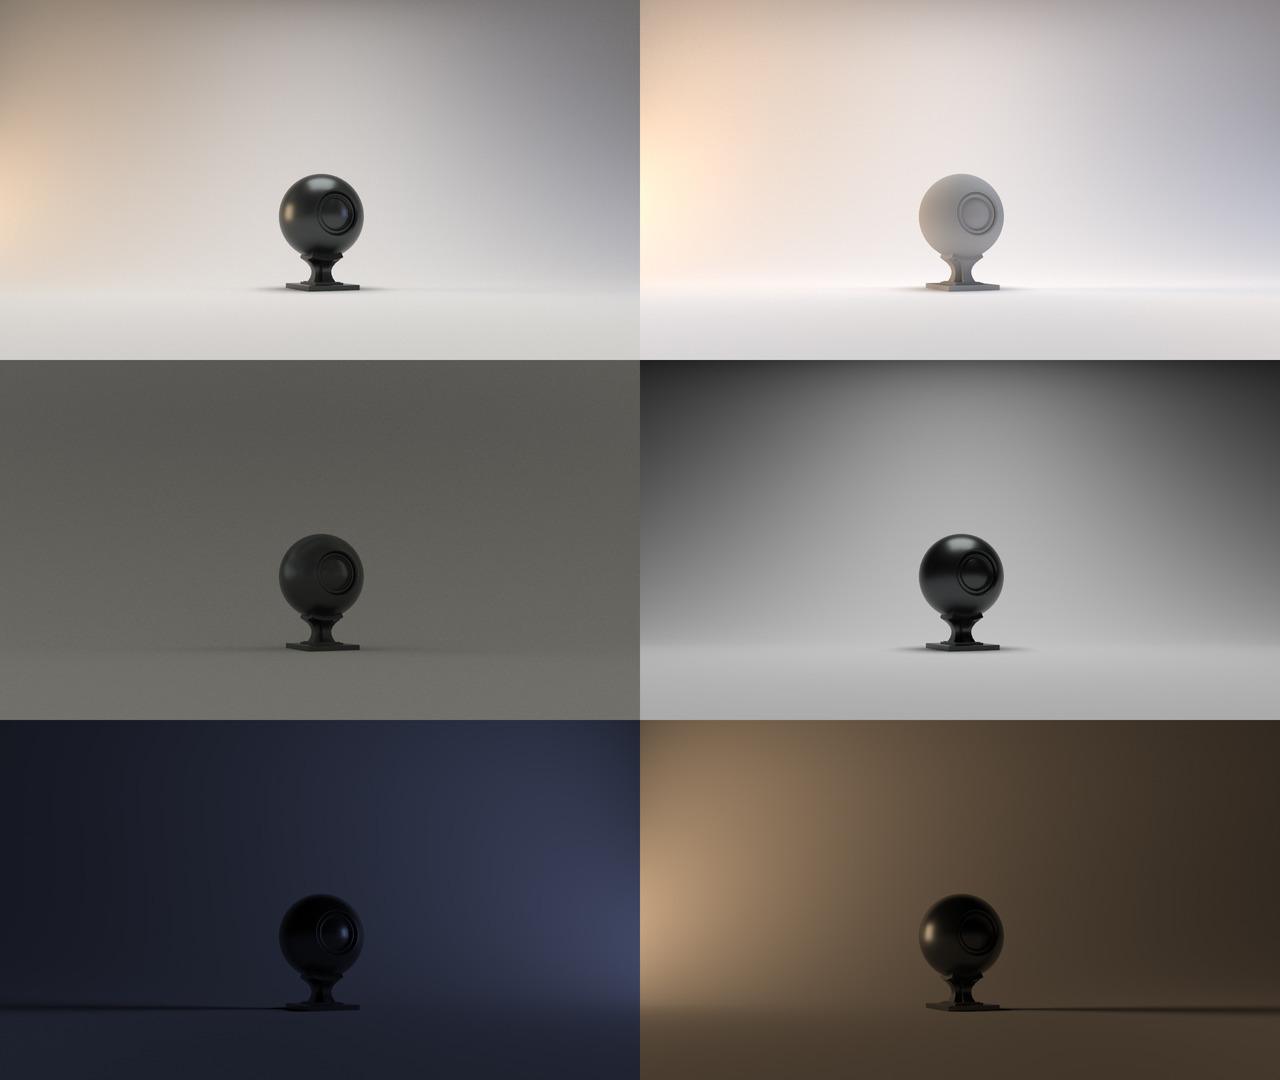 lighting_rigs.jpg